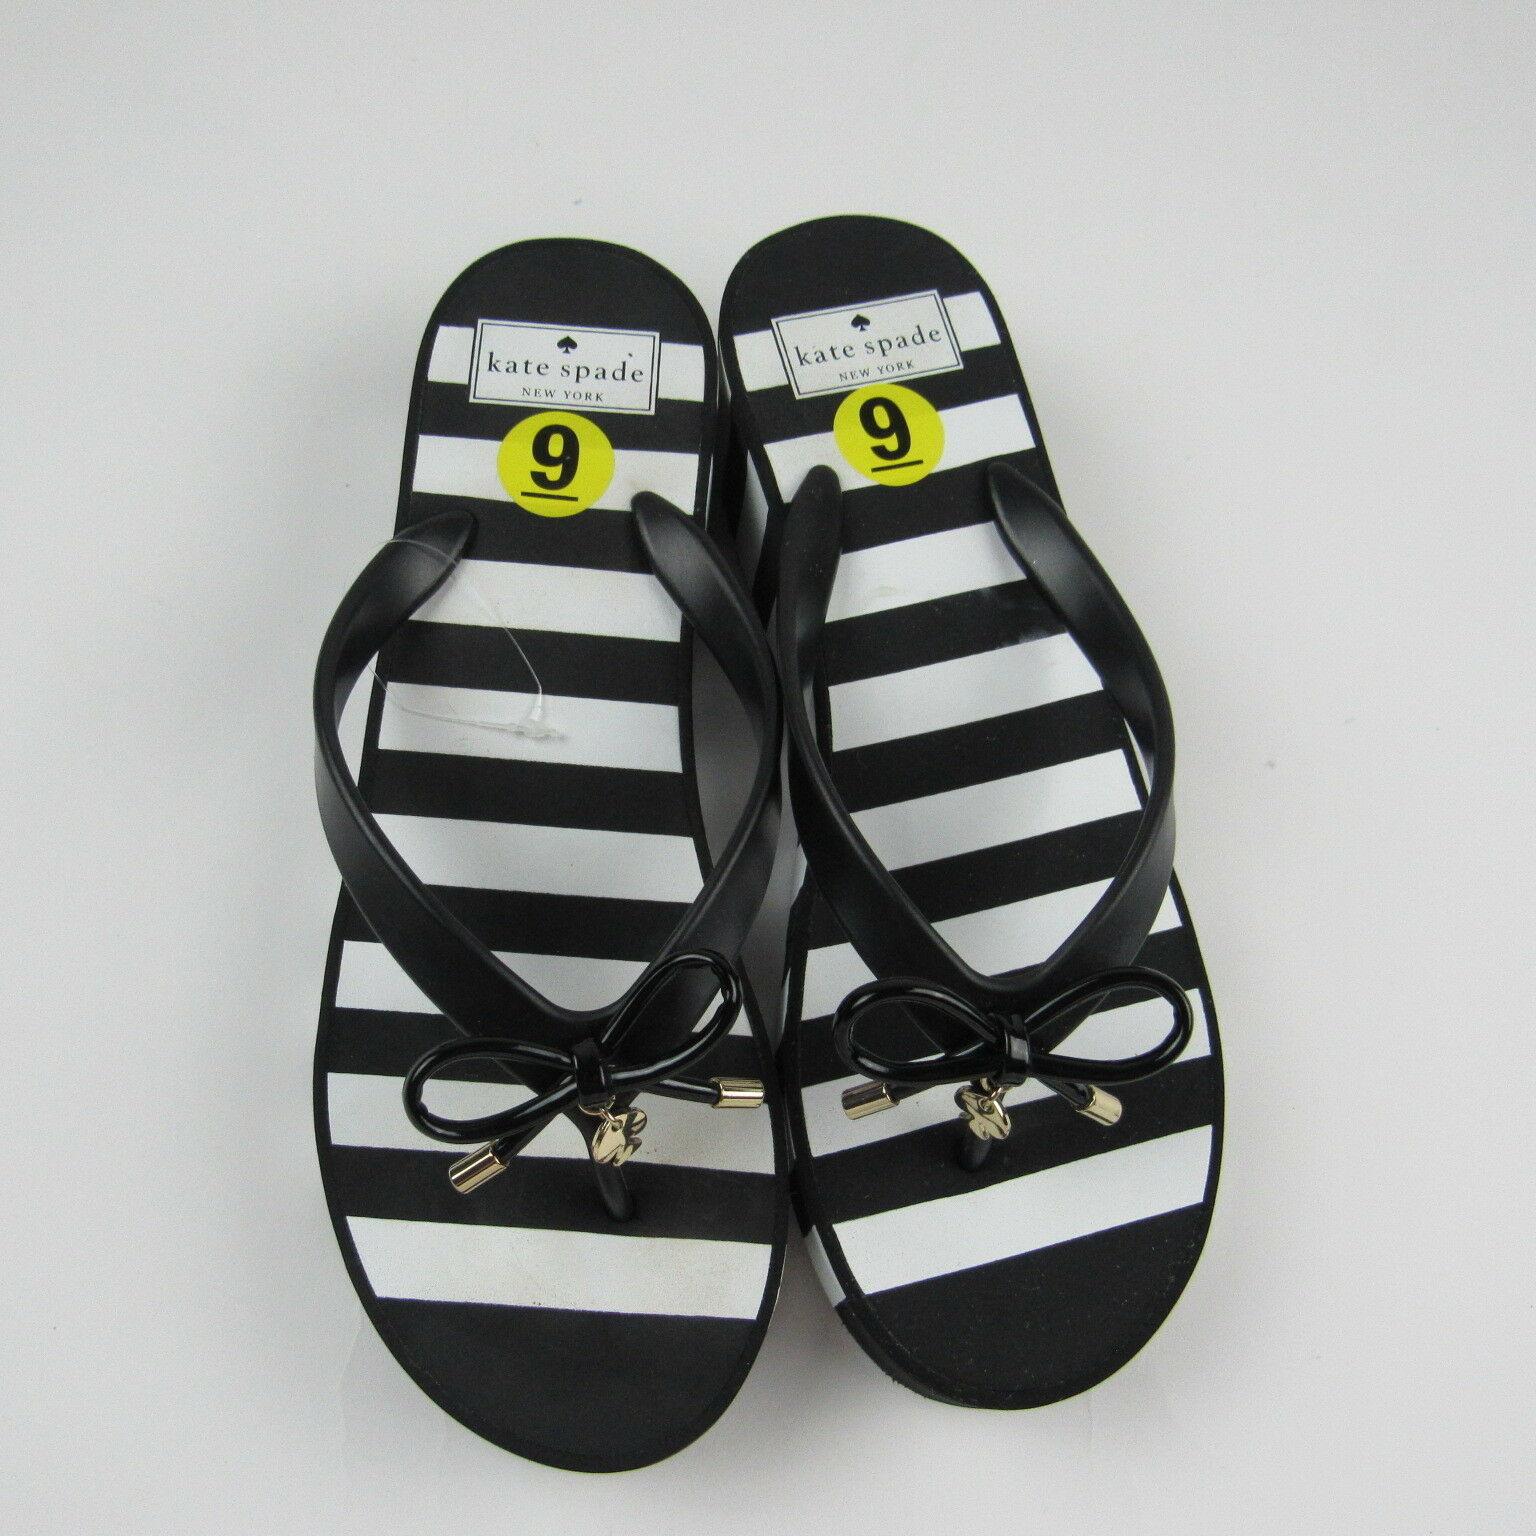 4b45bf6b5 Kate Spade Womens Flip Flops Sandals Black White Striped Platform Thong Bow